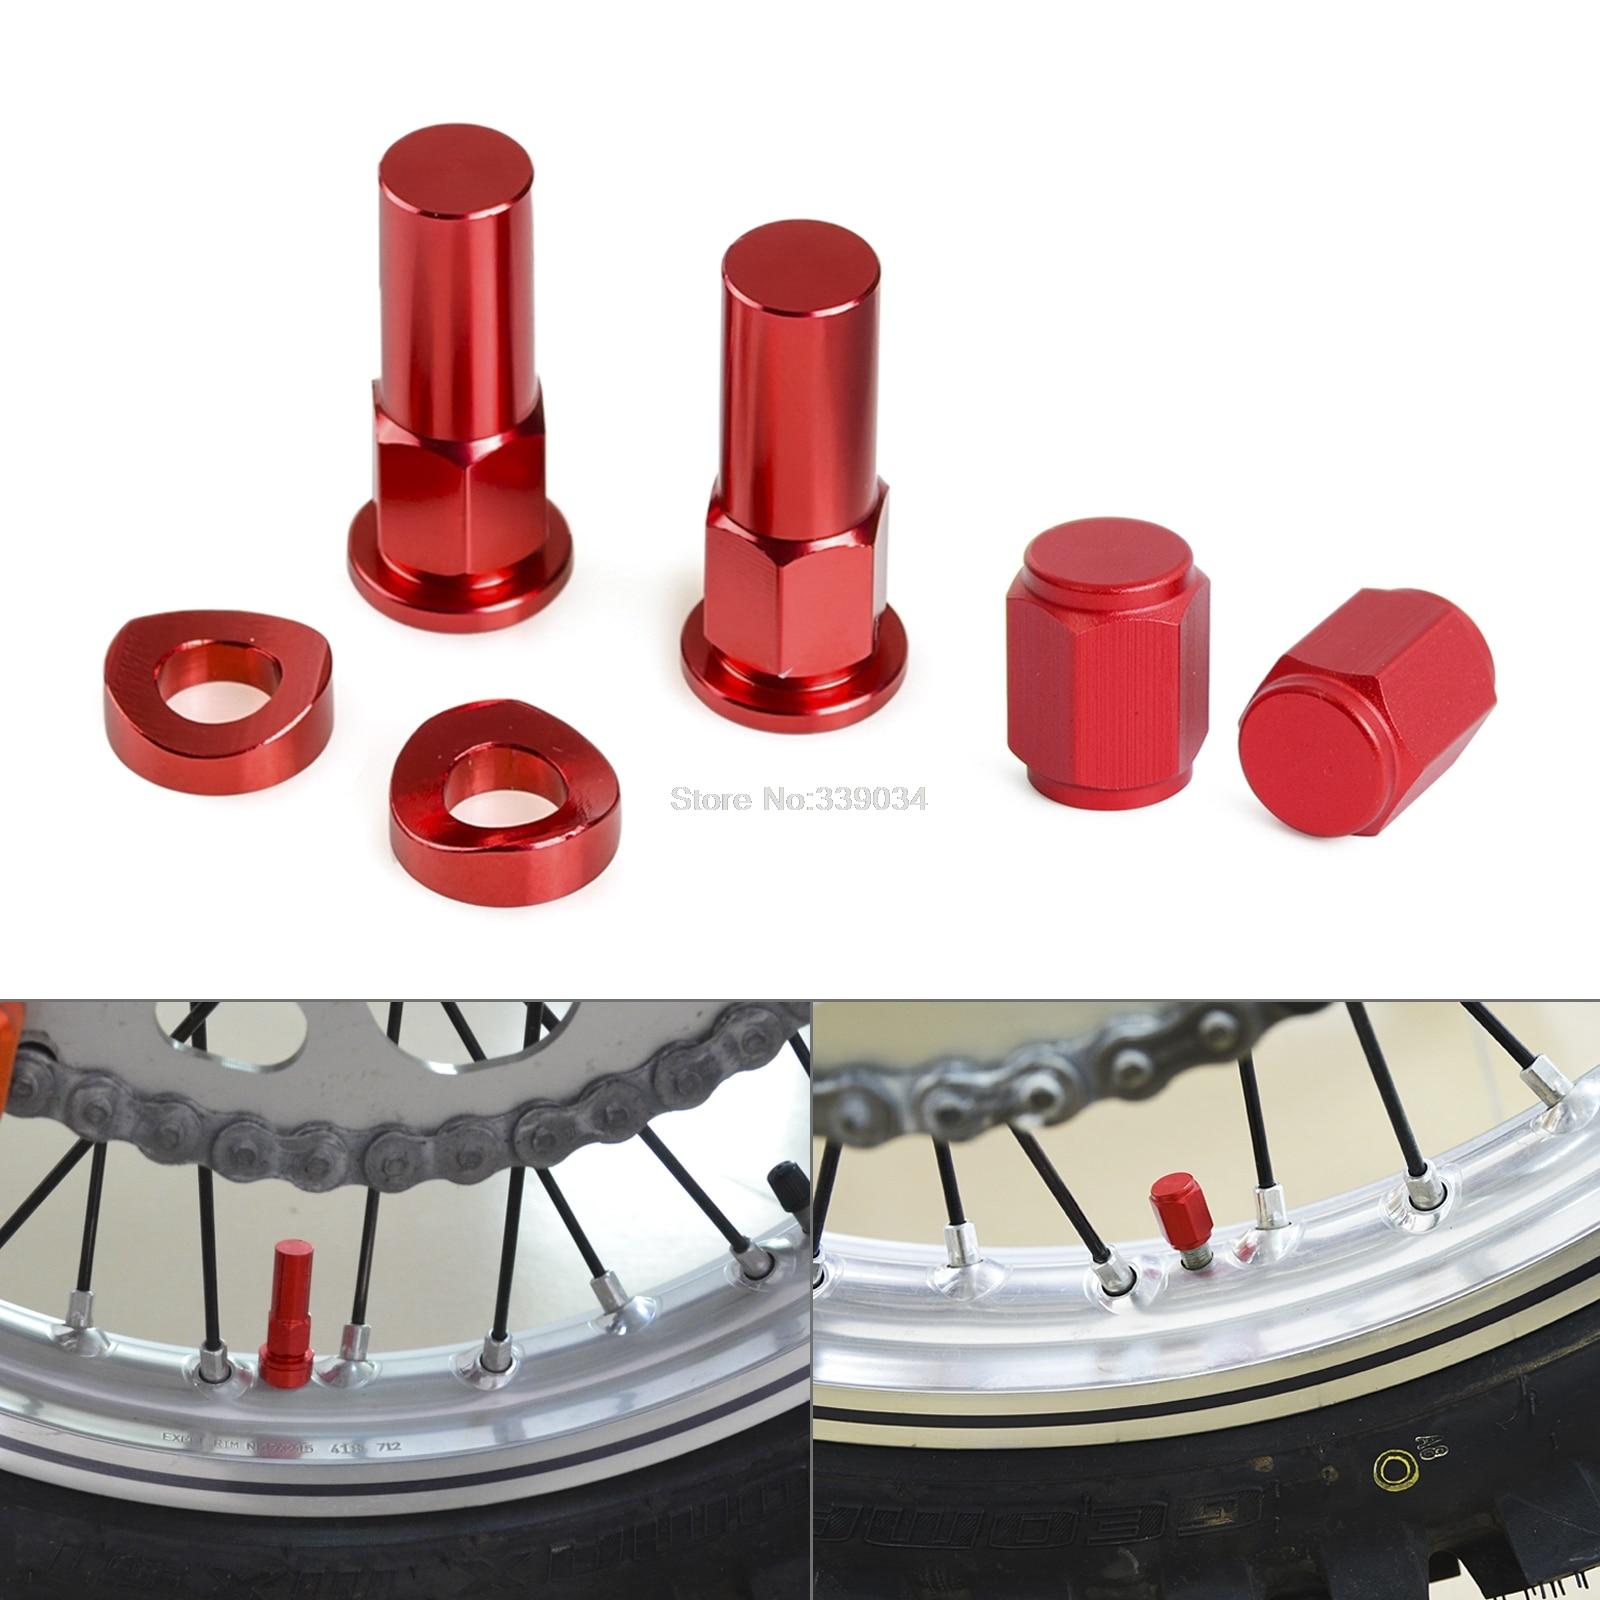 NICECNC Rim Lock Cover Nut Spacer Kit For Honda CR125R CR250R CRF125R CRF250R CRF450R CRF250L CRF250M Yamaha Suzuki Kawasaki